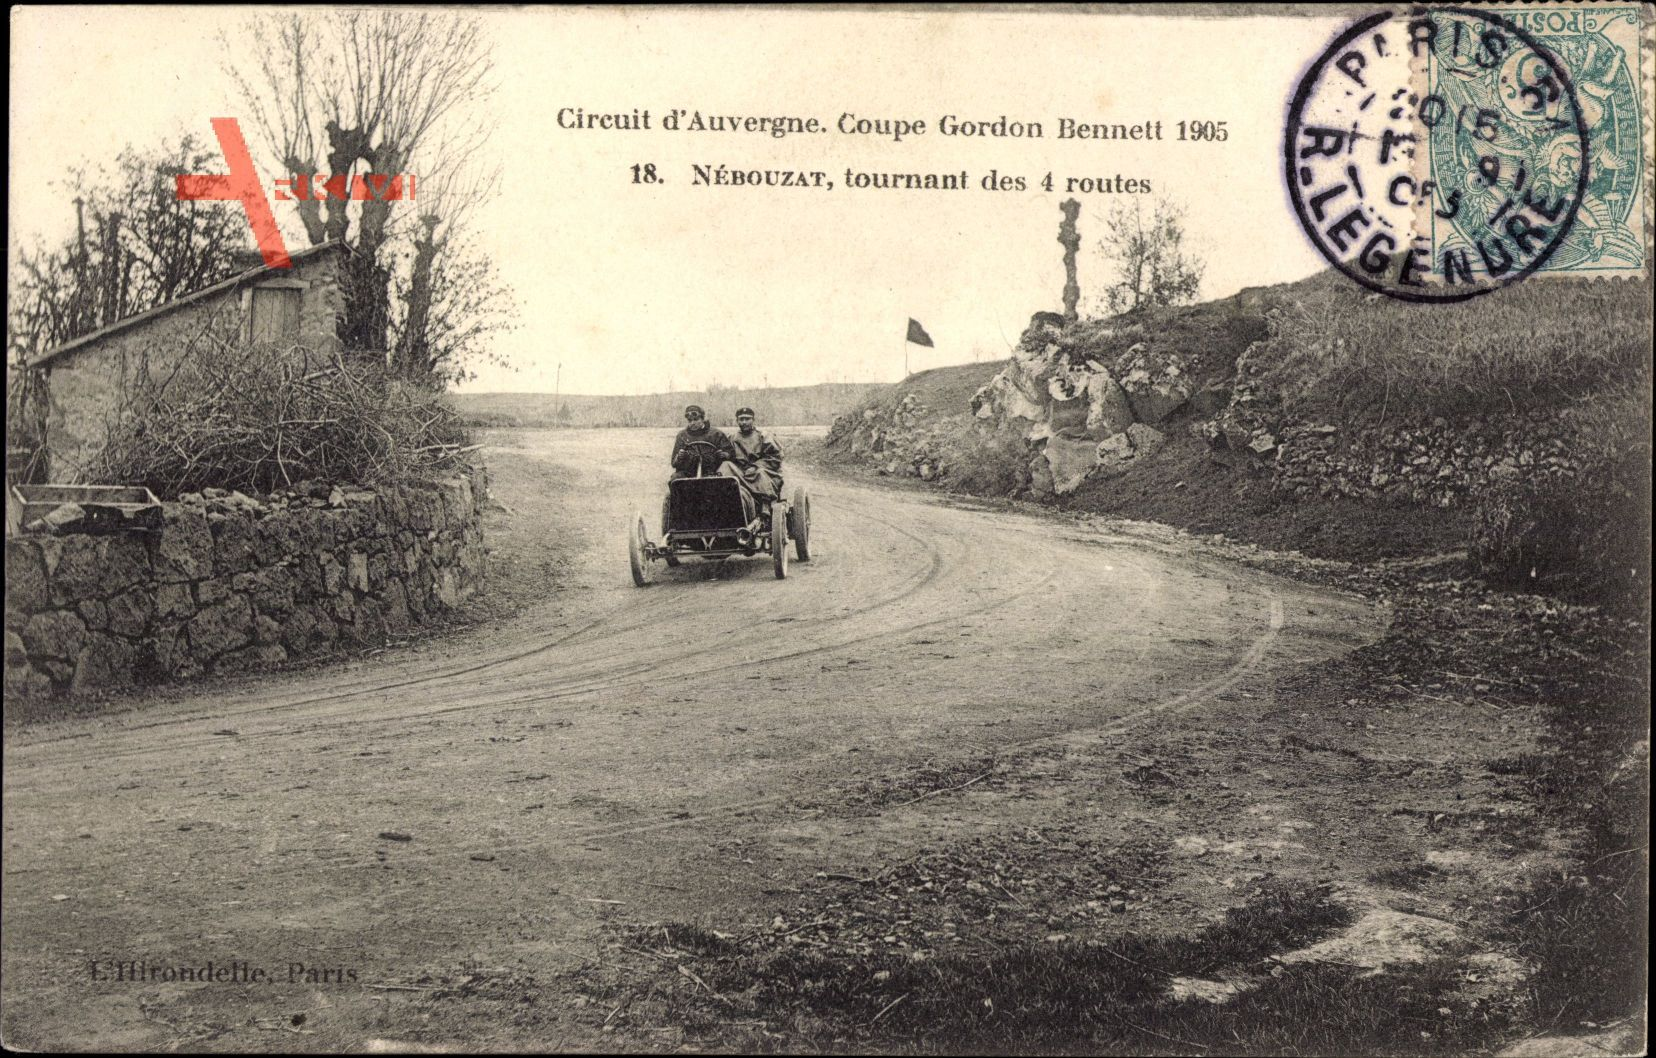 Circuit dAuvergne, Coupe Gordon Bennett 1905, Nébouzat, Autorennen